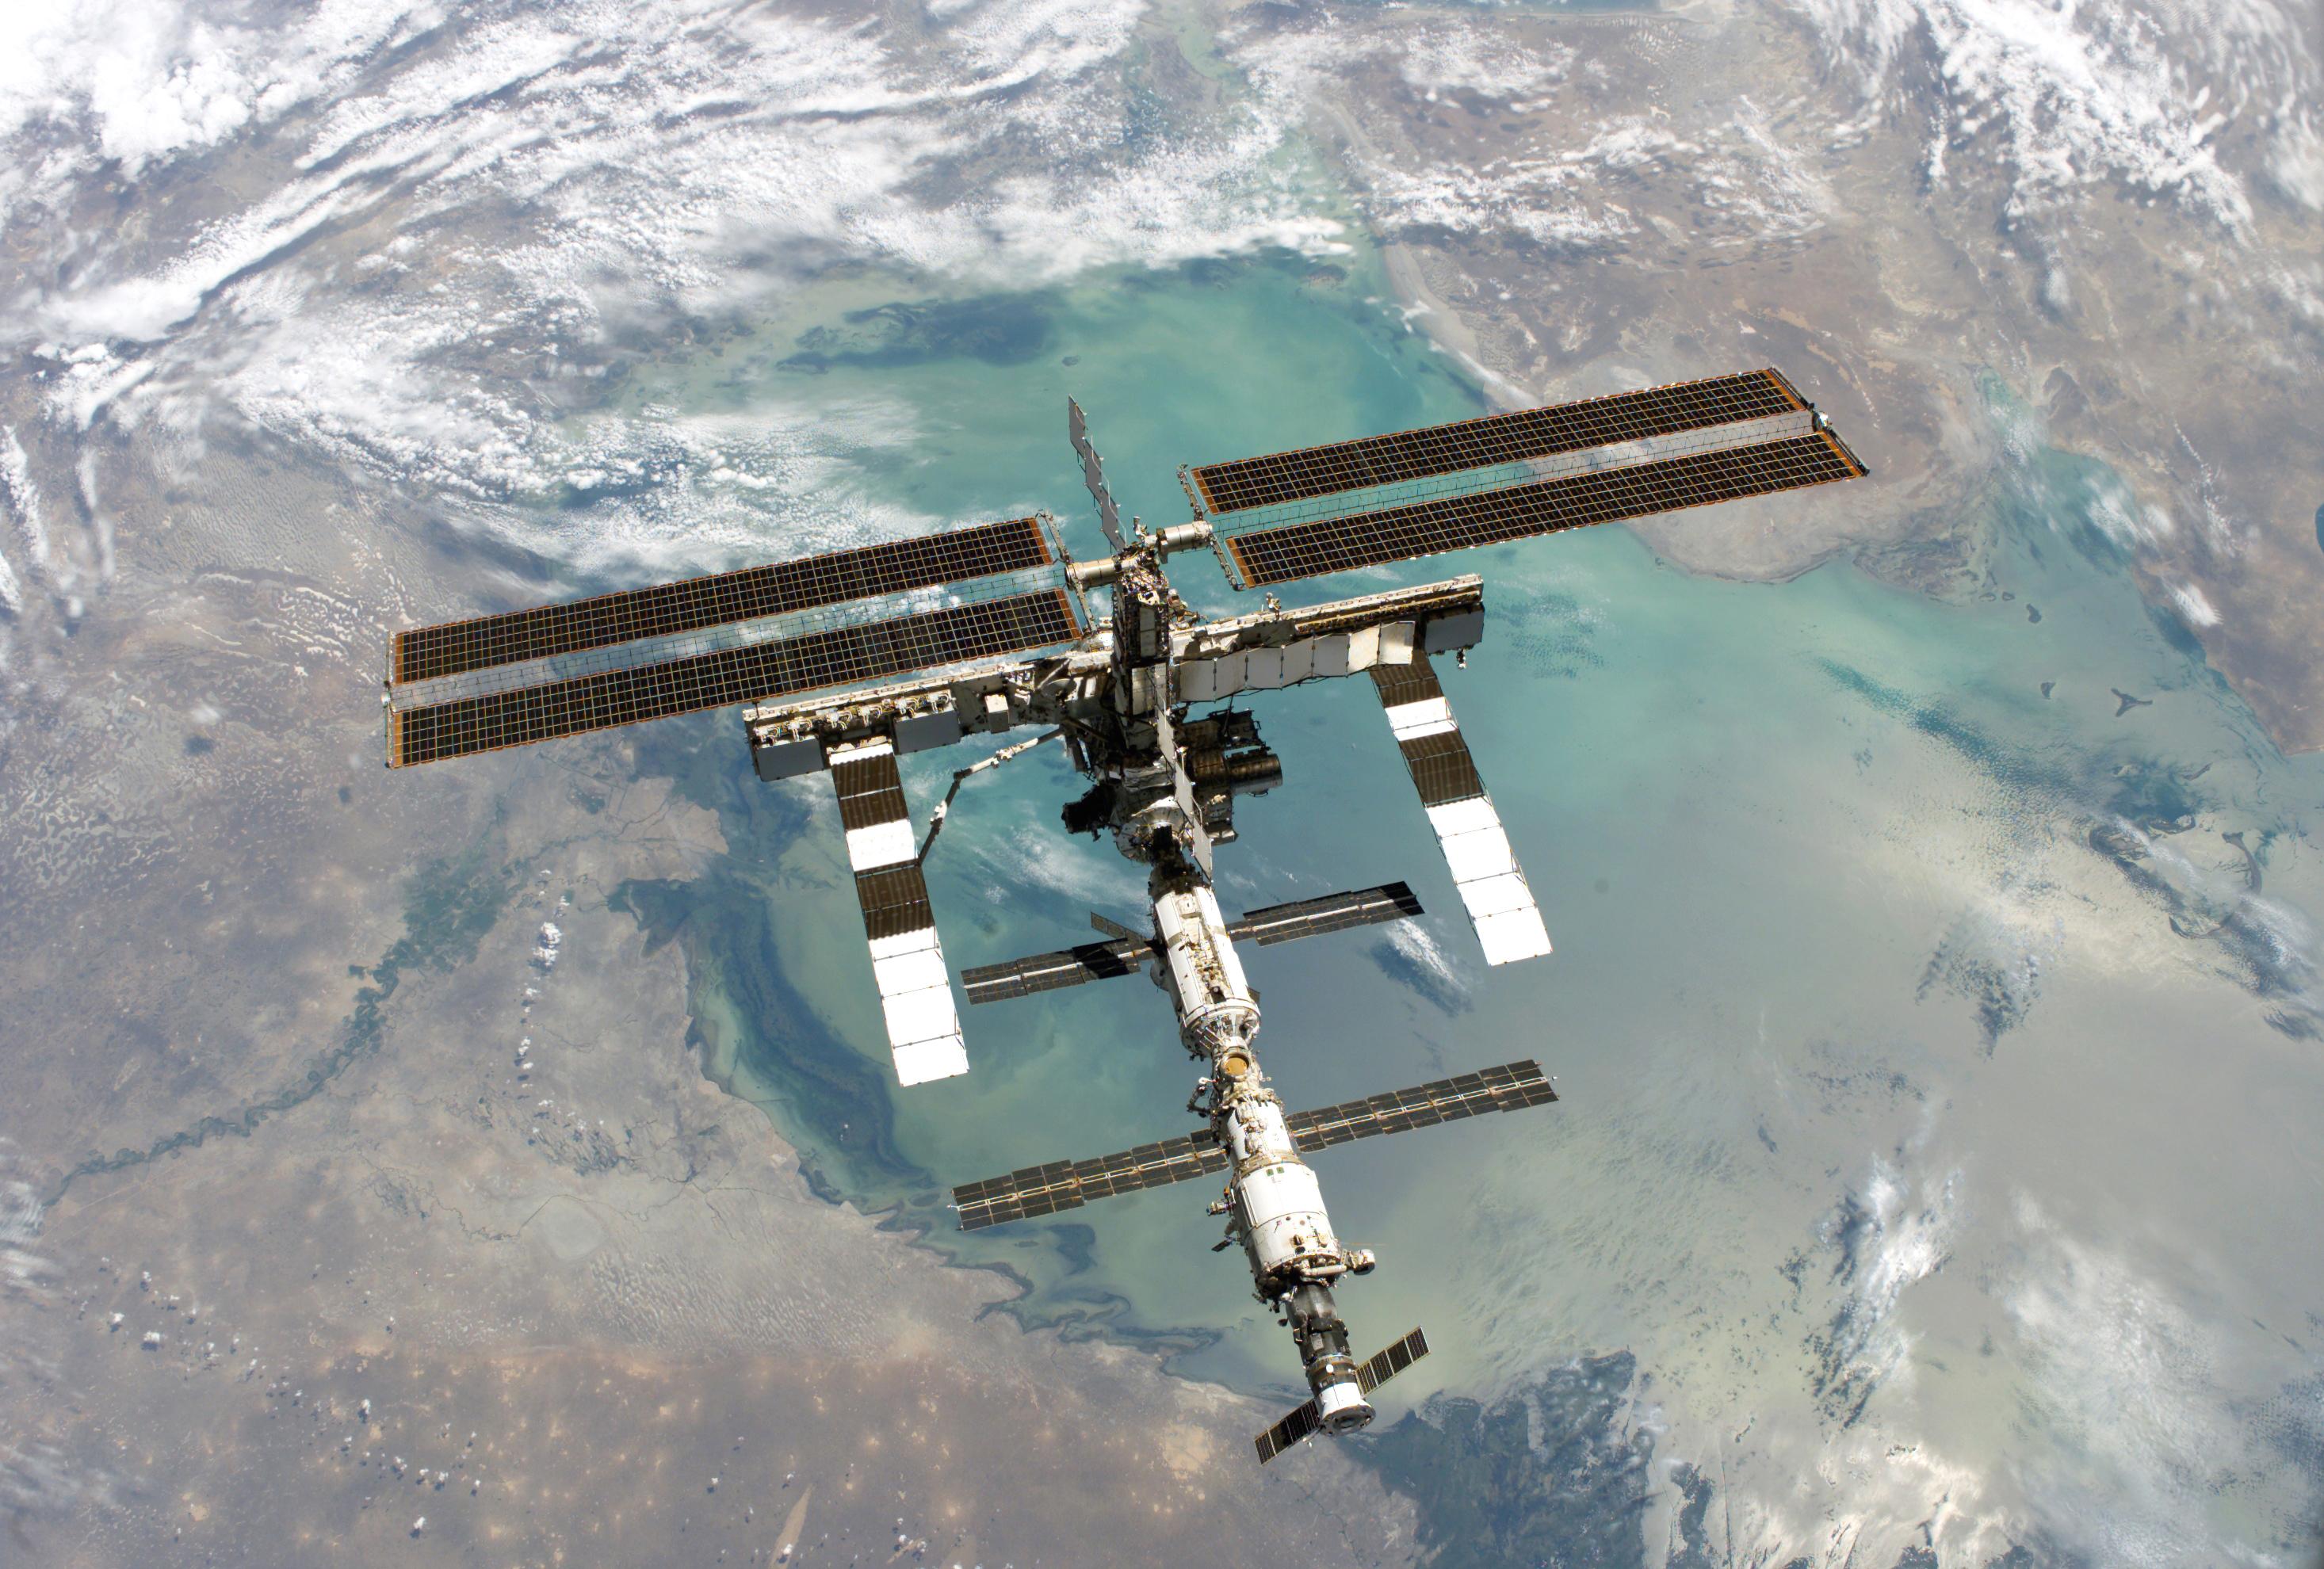 » International Space Station @HarrisonRuess